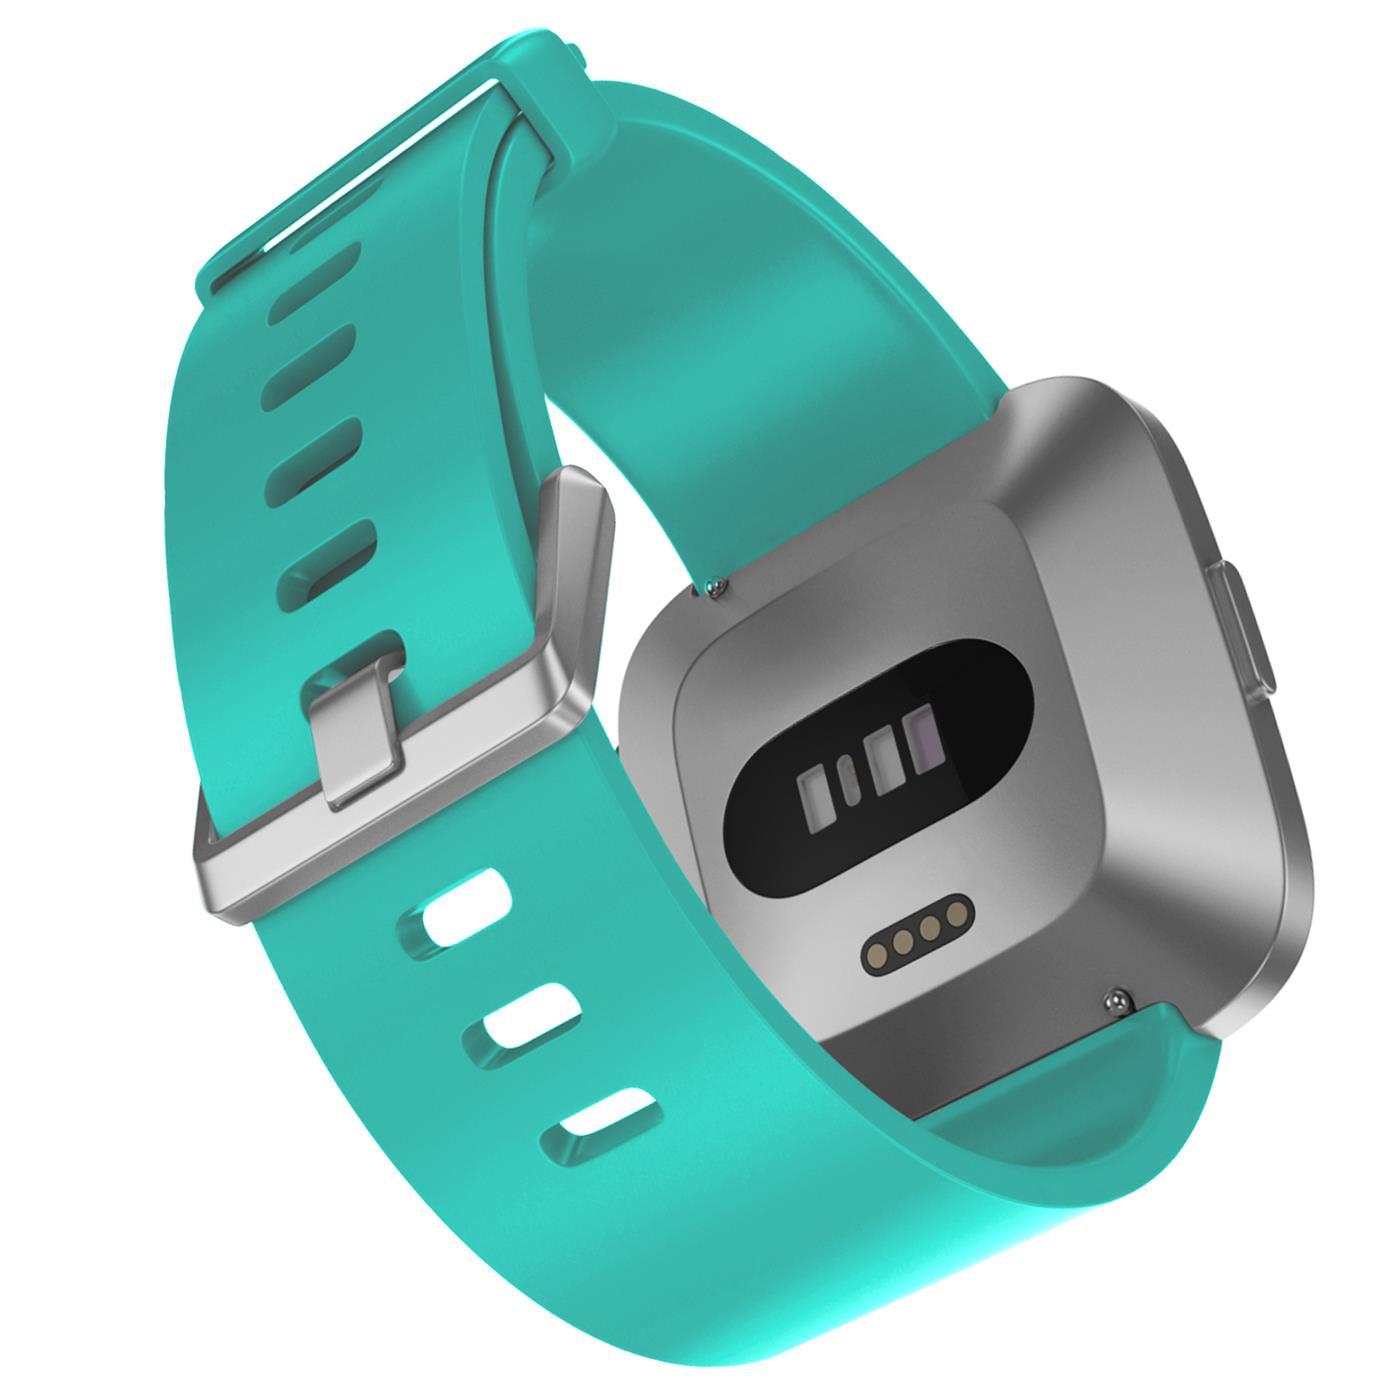 Fitbit-Groesse-S-oder-L-Ersatz-Silikon-Armband-Uhren-Sport-Band-Fitness-Tracker Indexbild 35